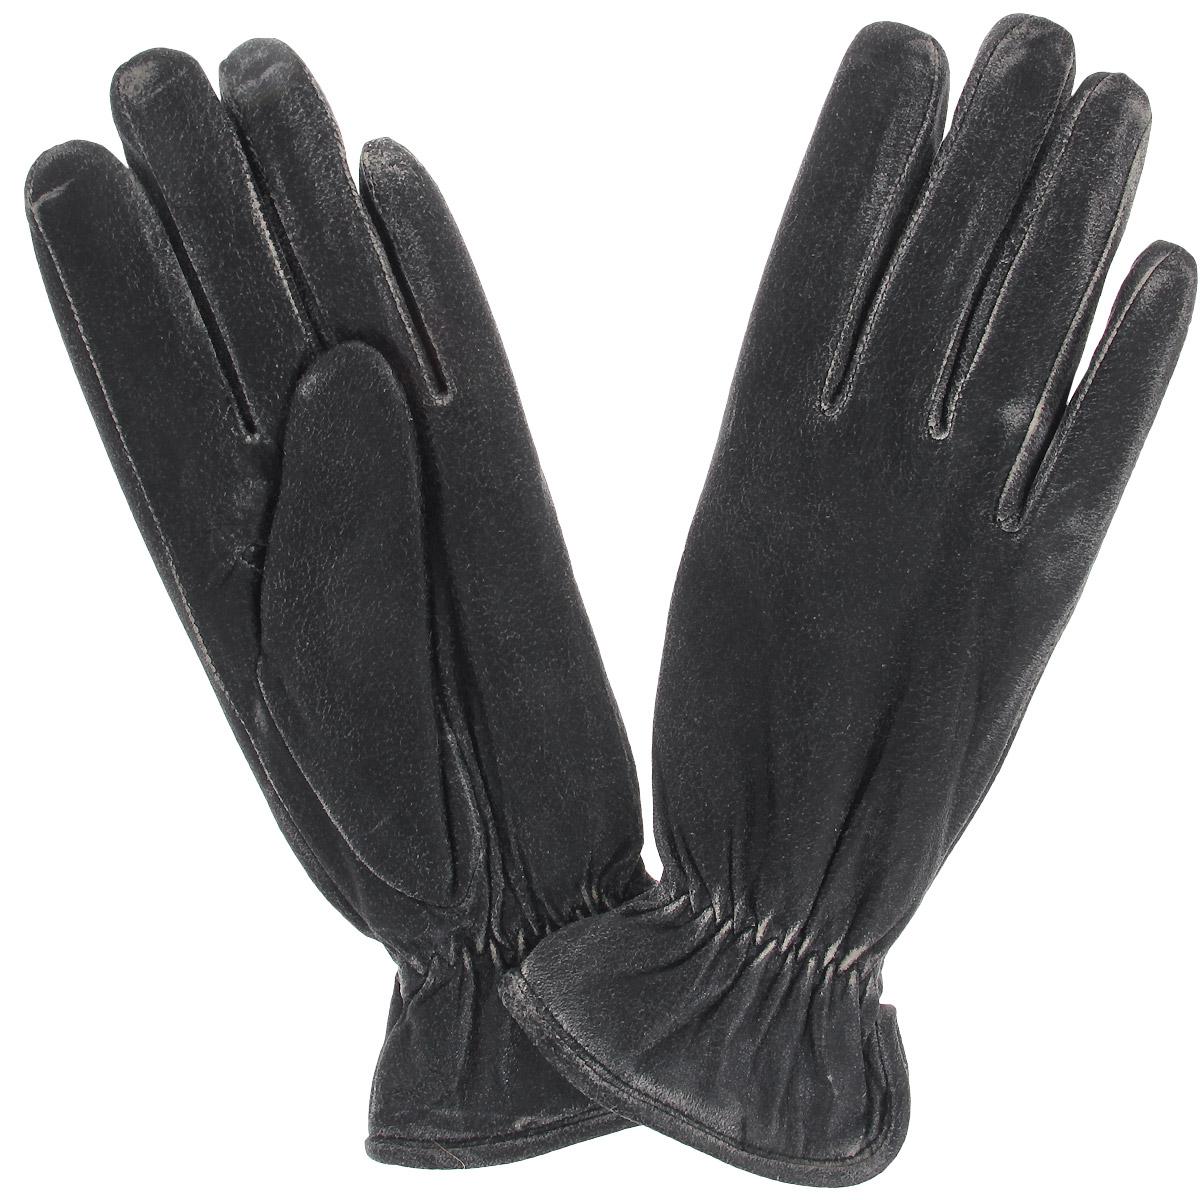 Перчатки женские Dali Exclusive, цвет: серый. VIALE/MEL. Размер 8 цены онлайн